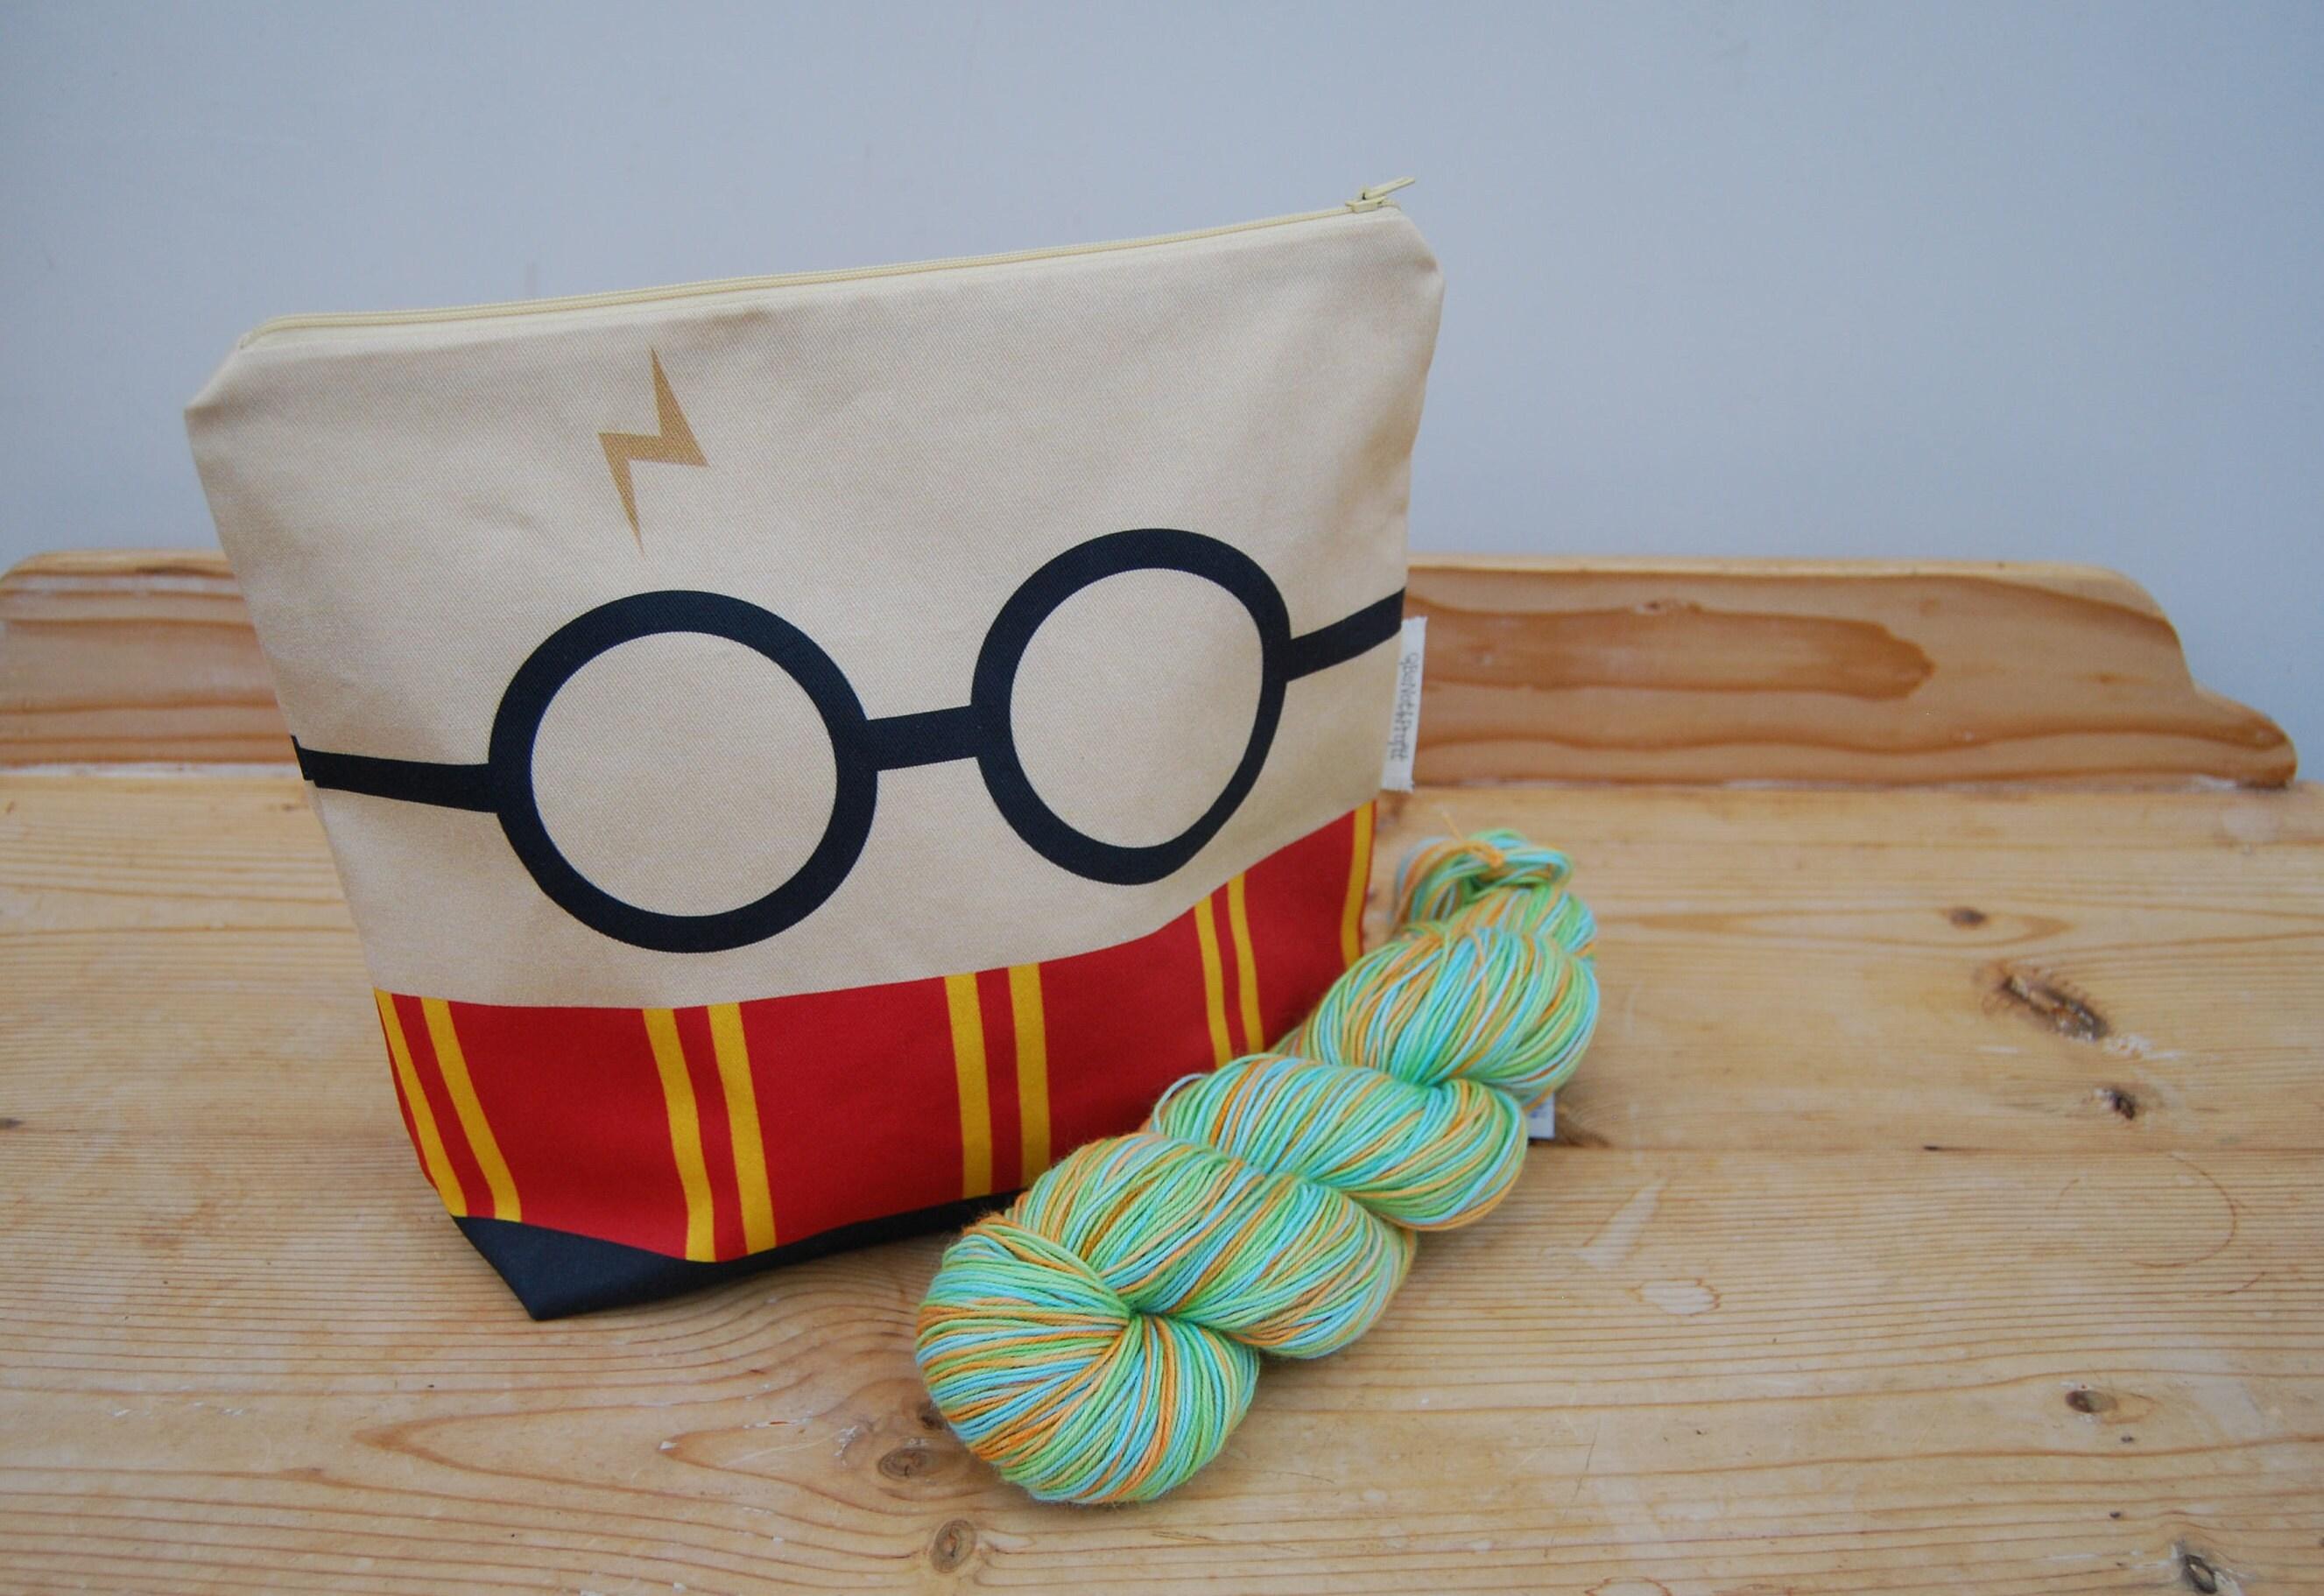 Medium knitting  crochet project bag  Harry Potter themed  Make up bag